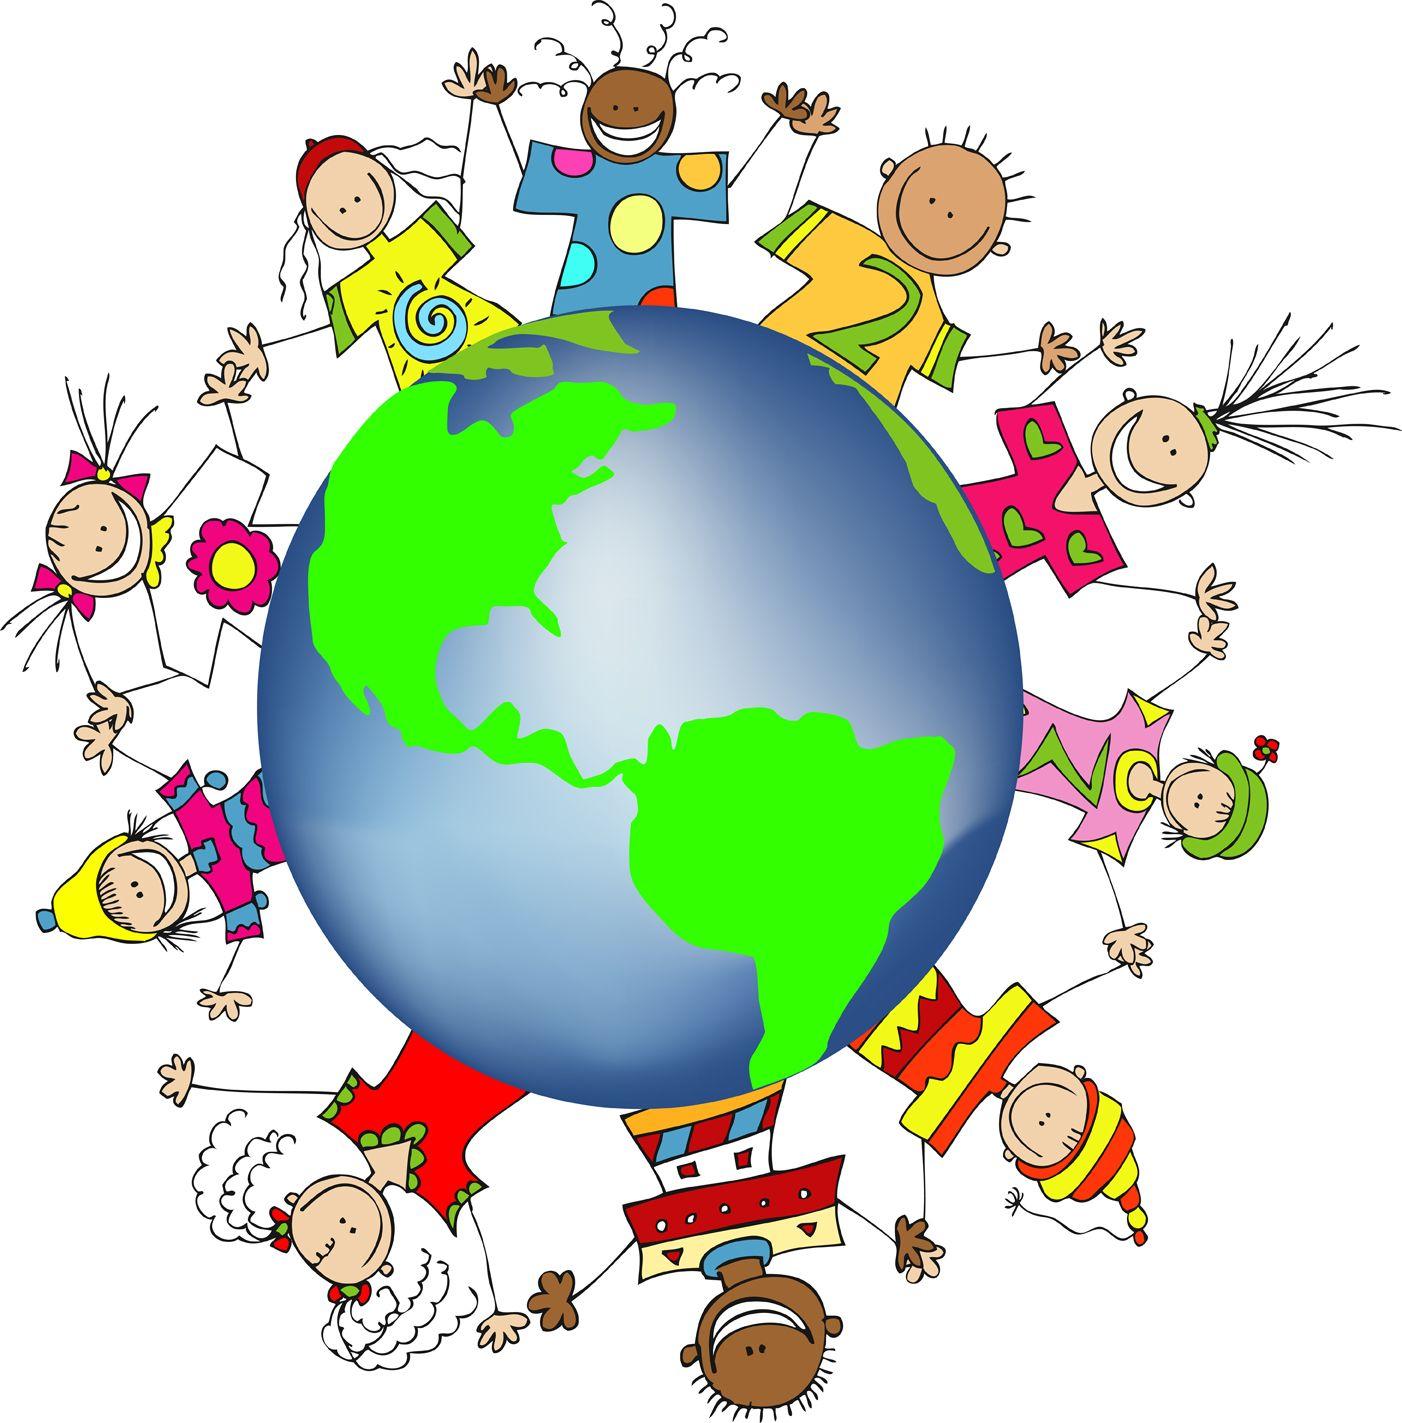 1402x1423 Kids World Hands Friends Networks Globe Illustration Small Free